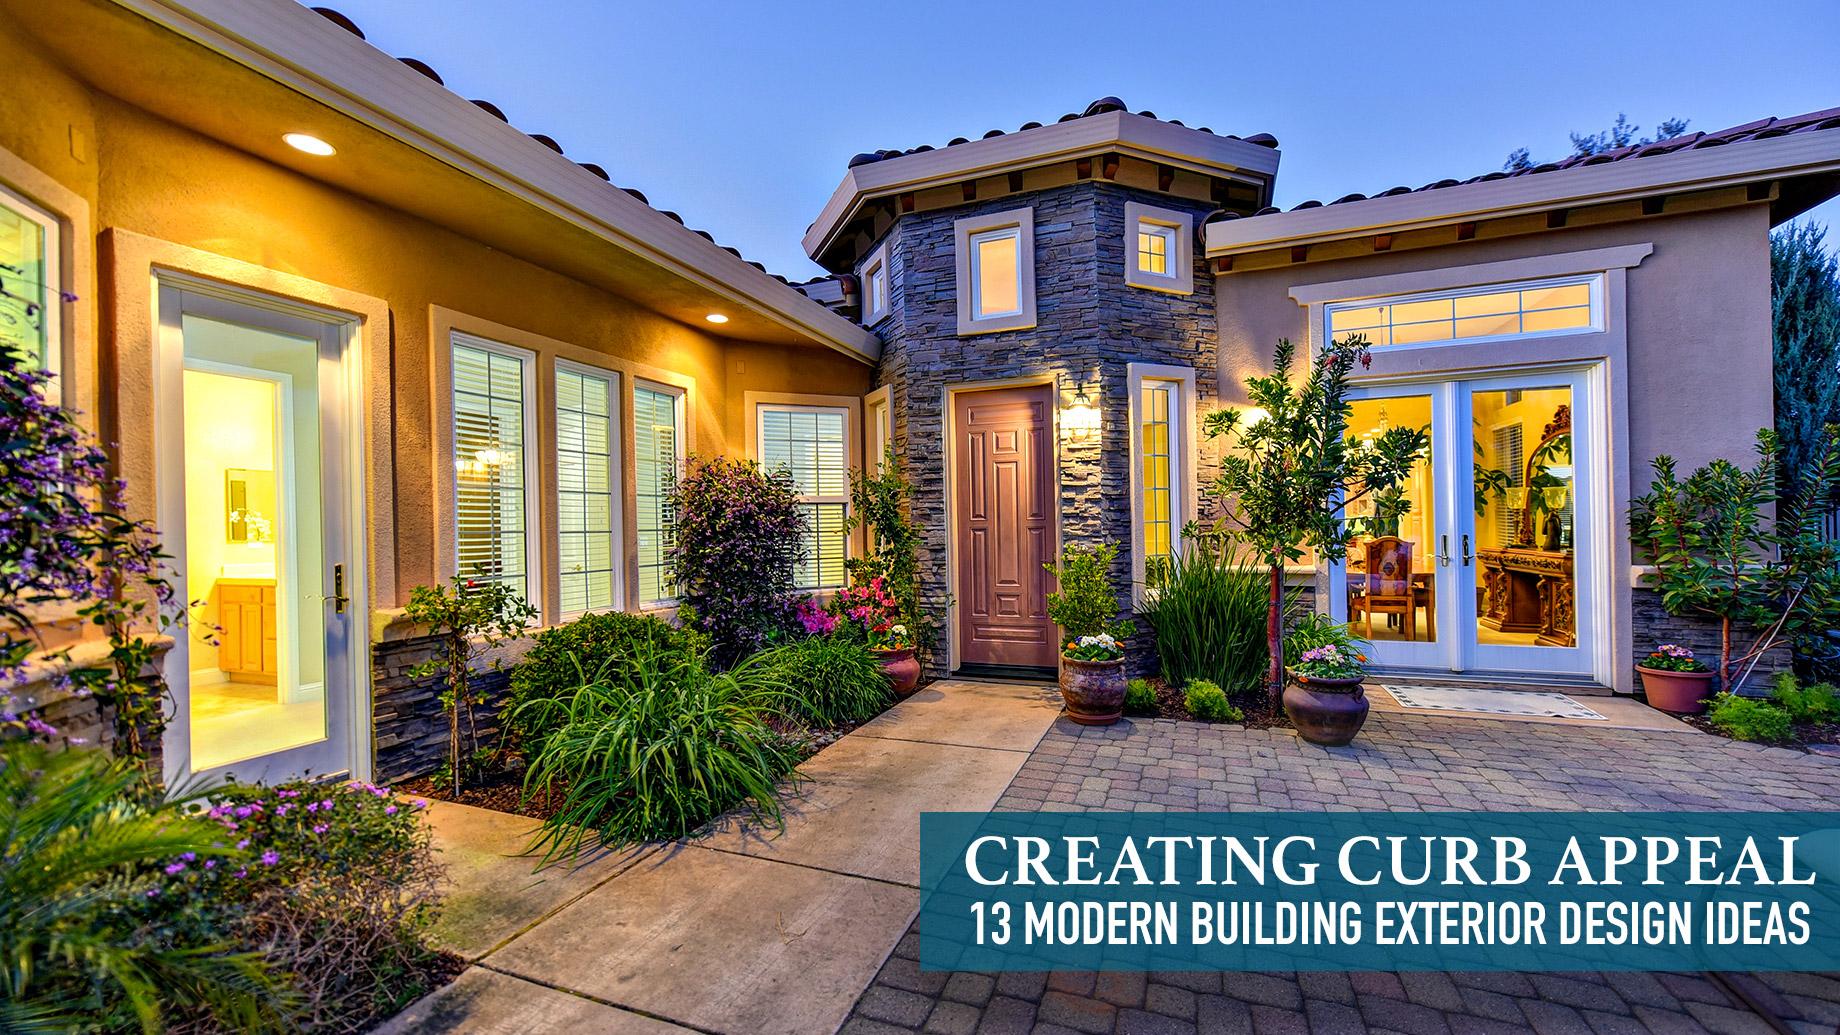 Creating Curb Appeal 13 Modern Building Exterior Design Ideas The Pinnacle List